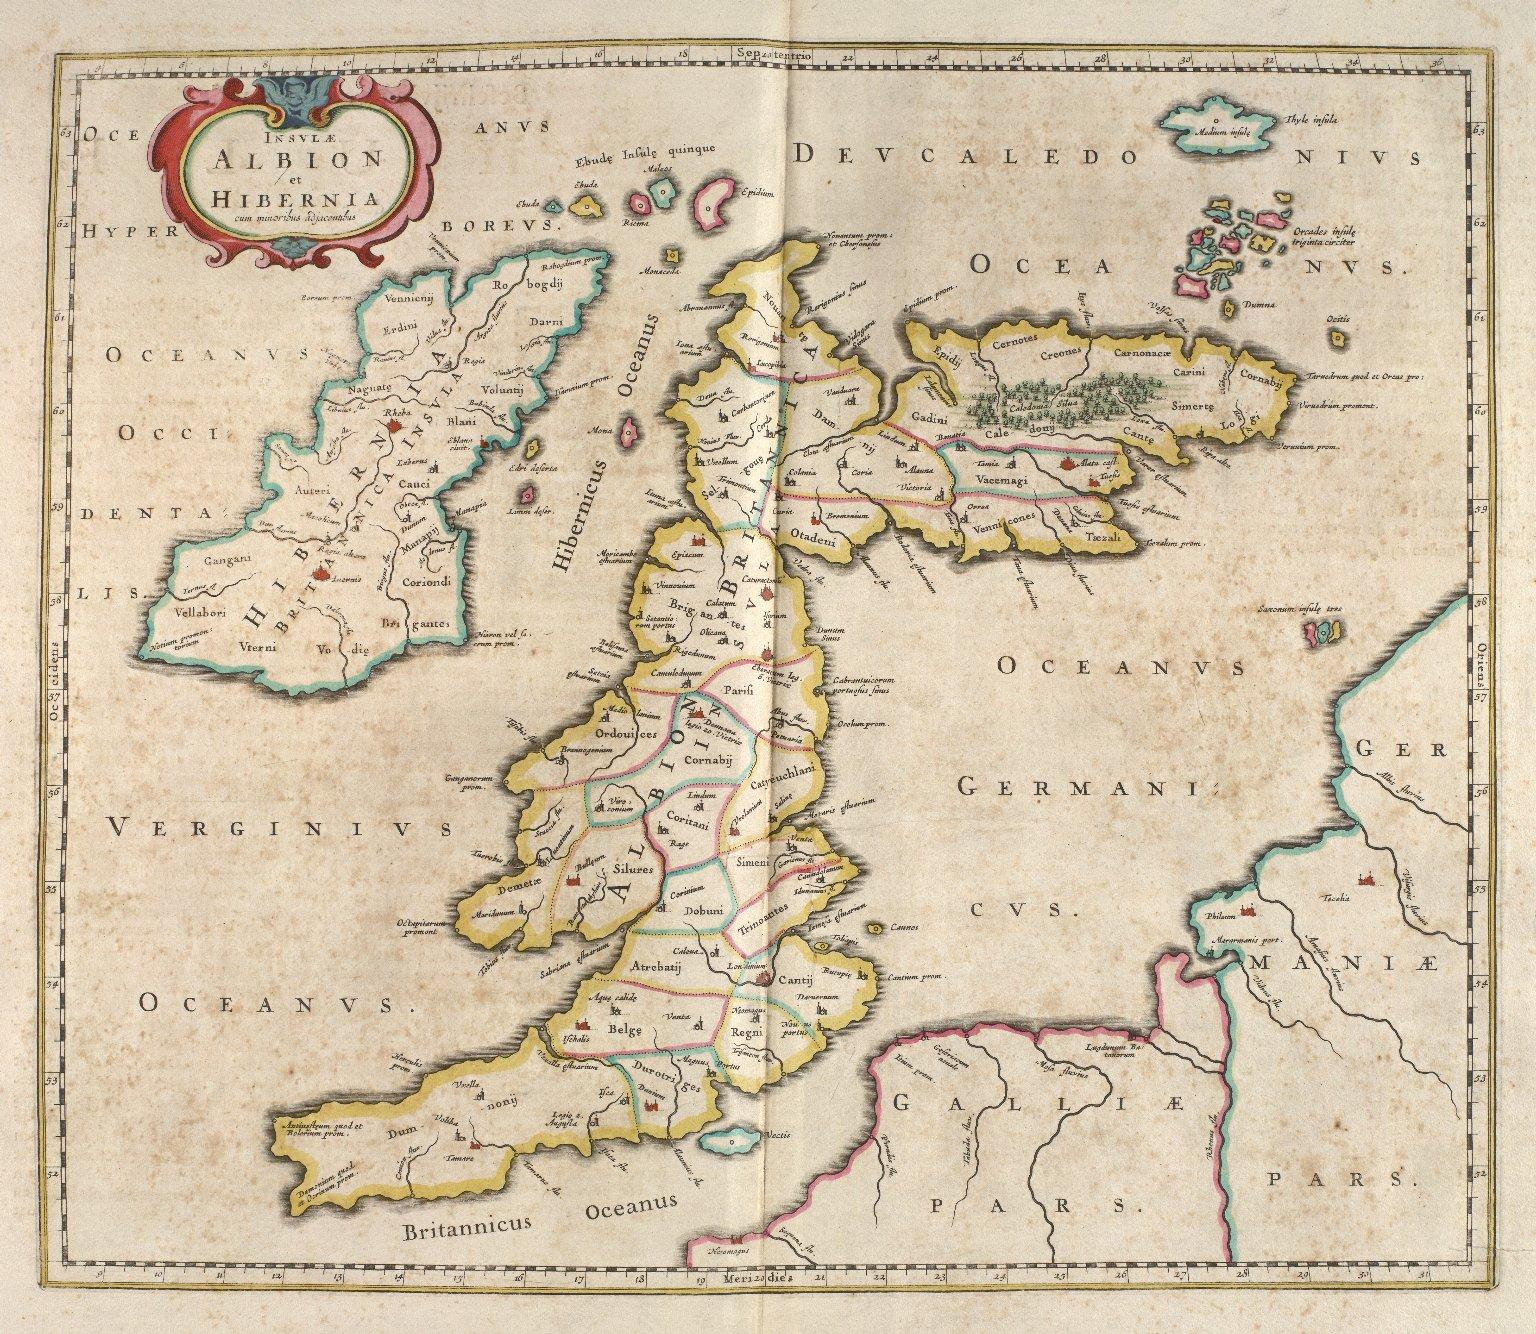 [Geographiae Blavianae] [Also known as: Atlas major] [013 of 153]